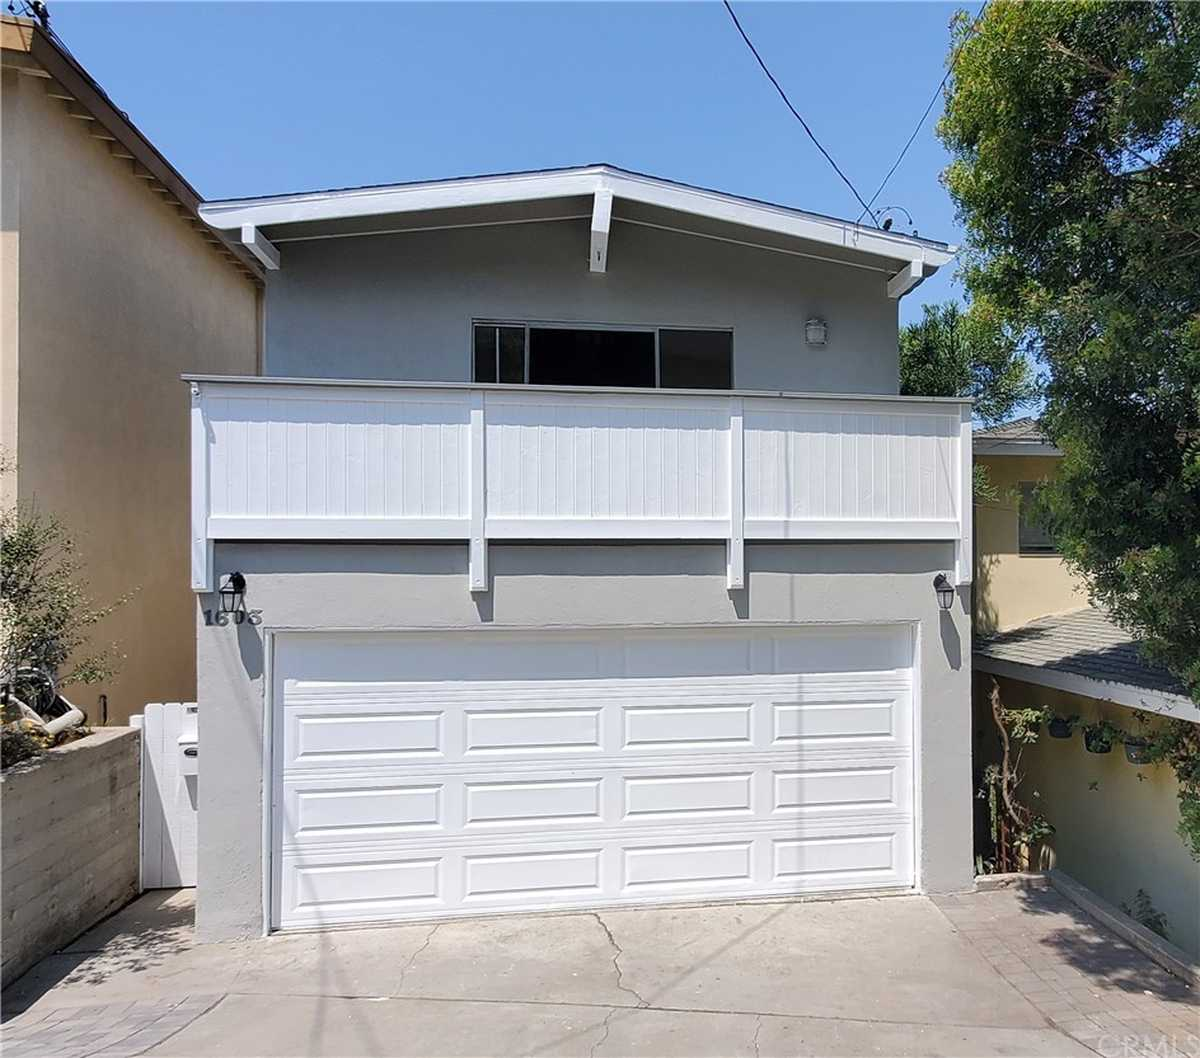 $1,099,000 - 3Br/2Ba -  for Sale in Redondo Beach